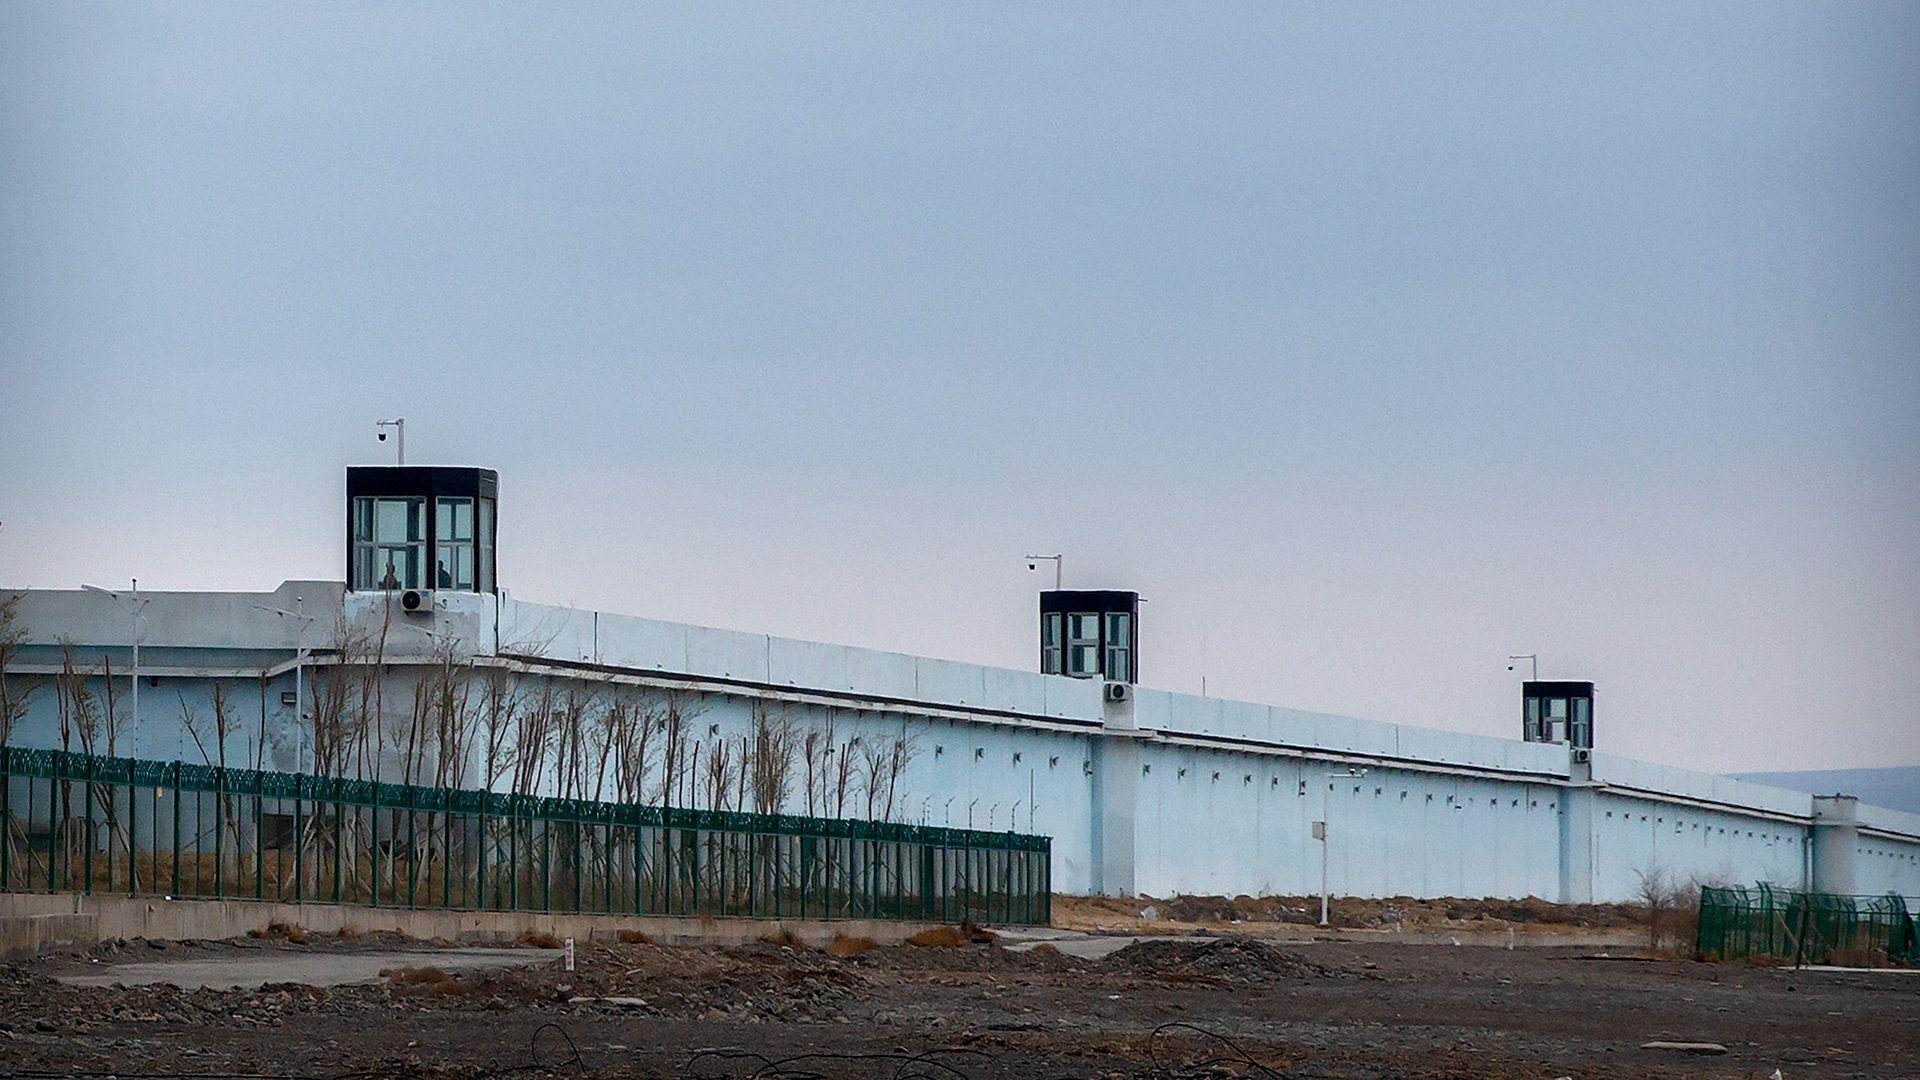 centro detencion carcel china Dabancheng